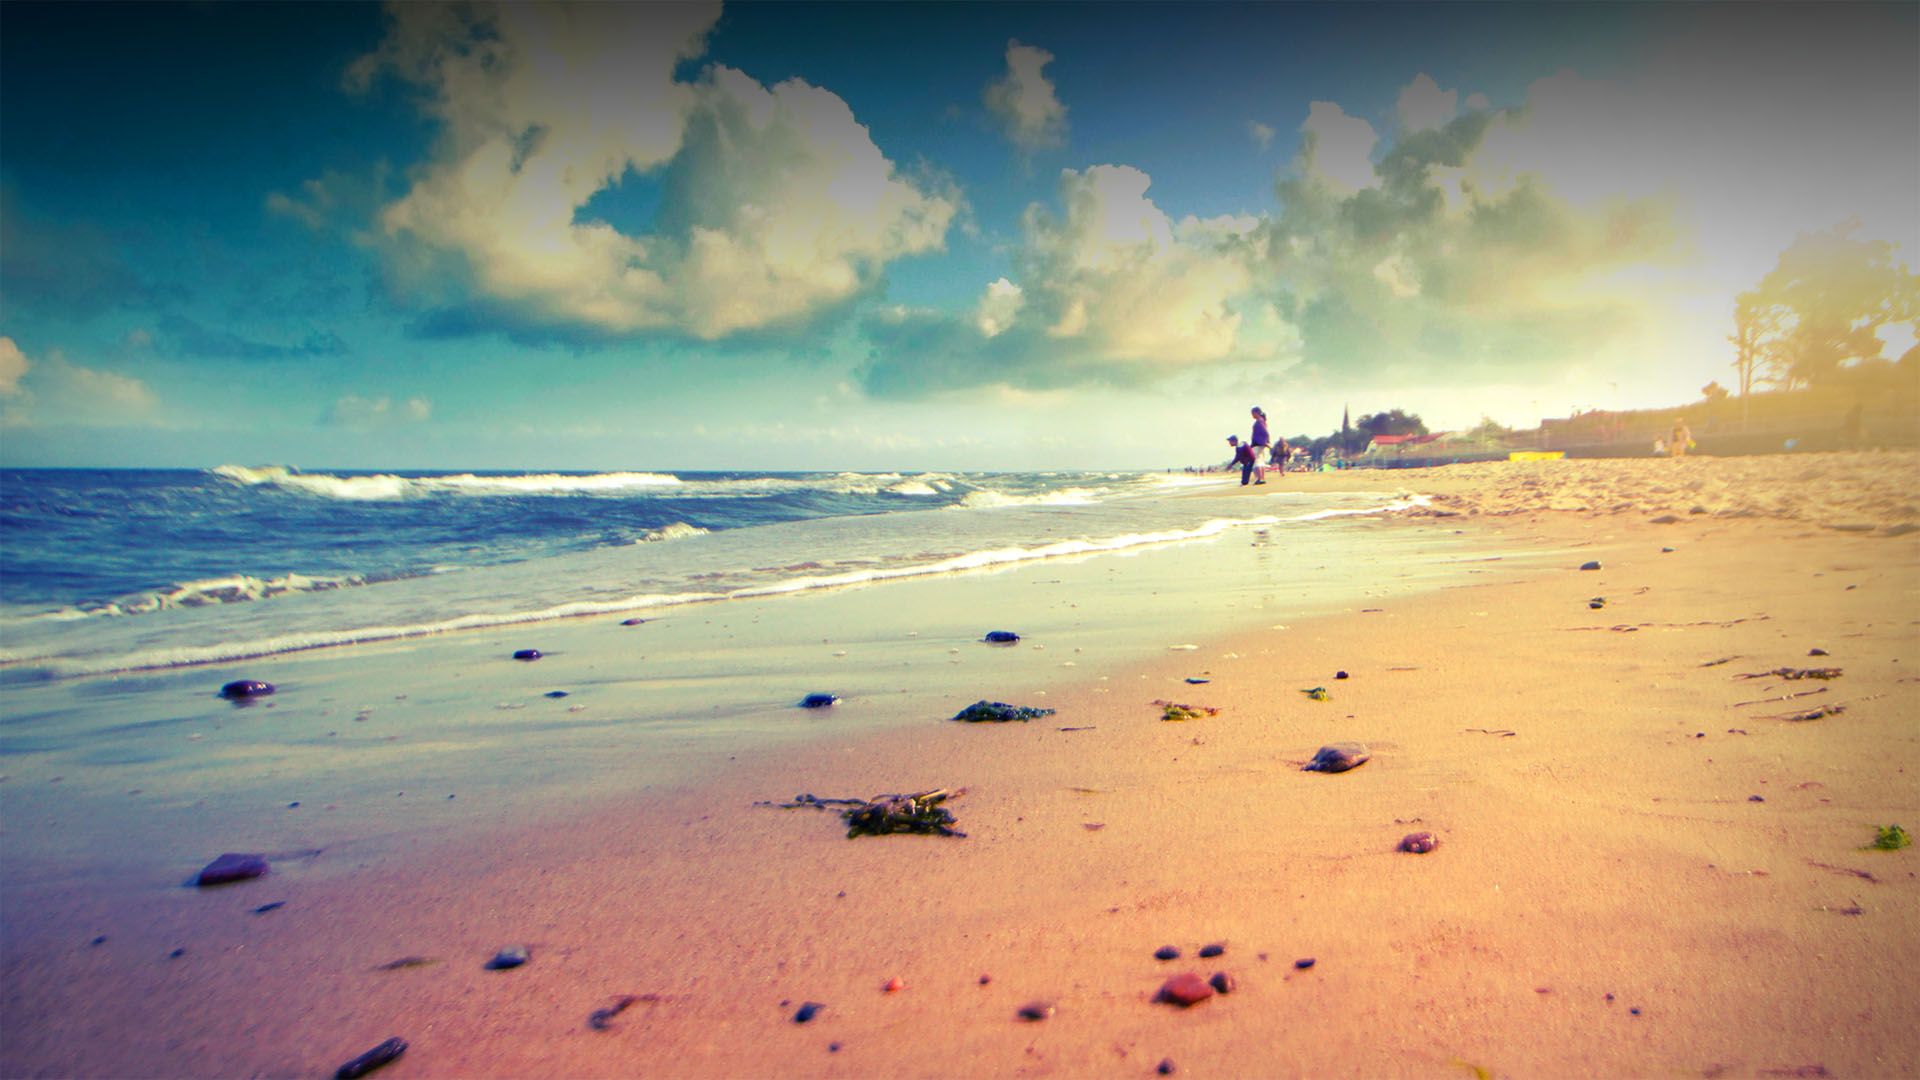 Nieduże fale, piasek, na niebie piękne chmury.